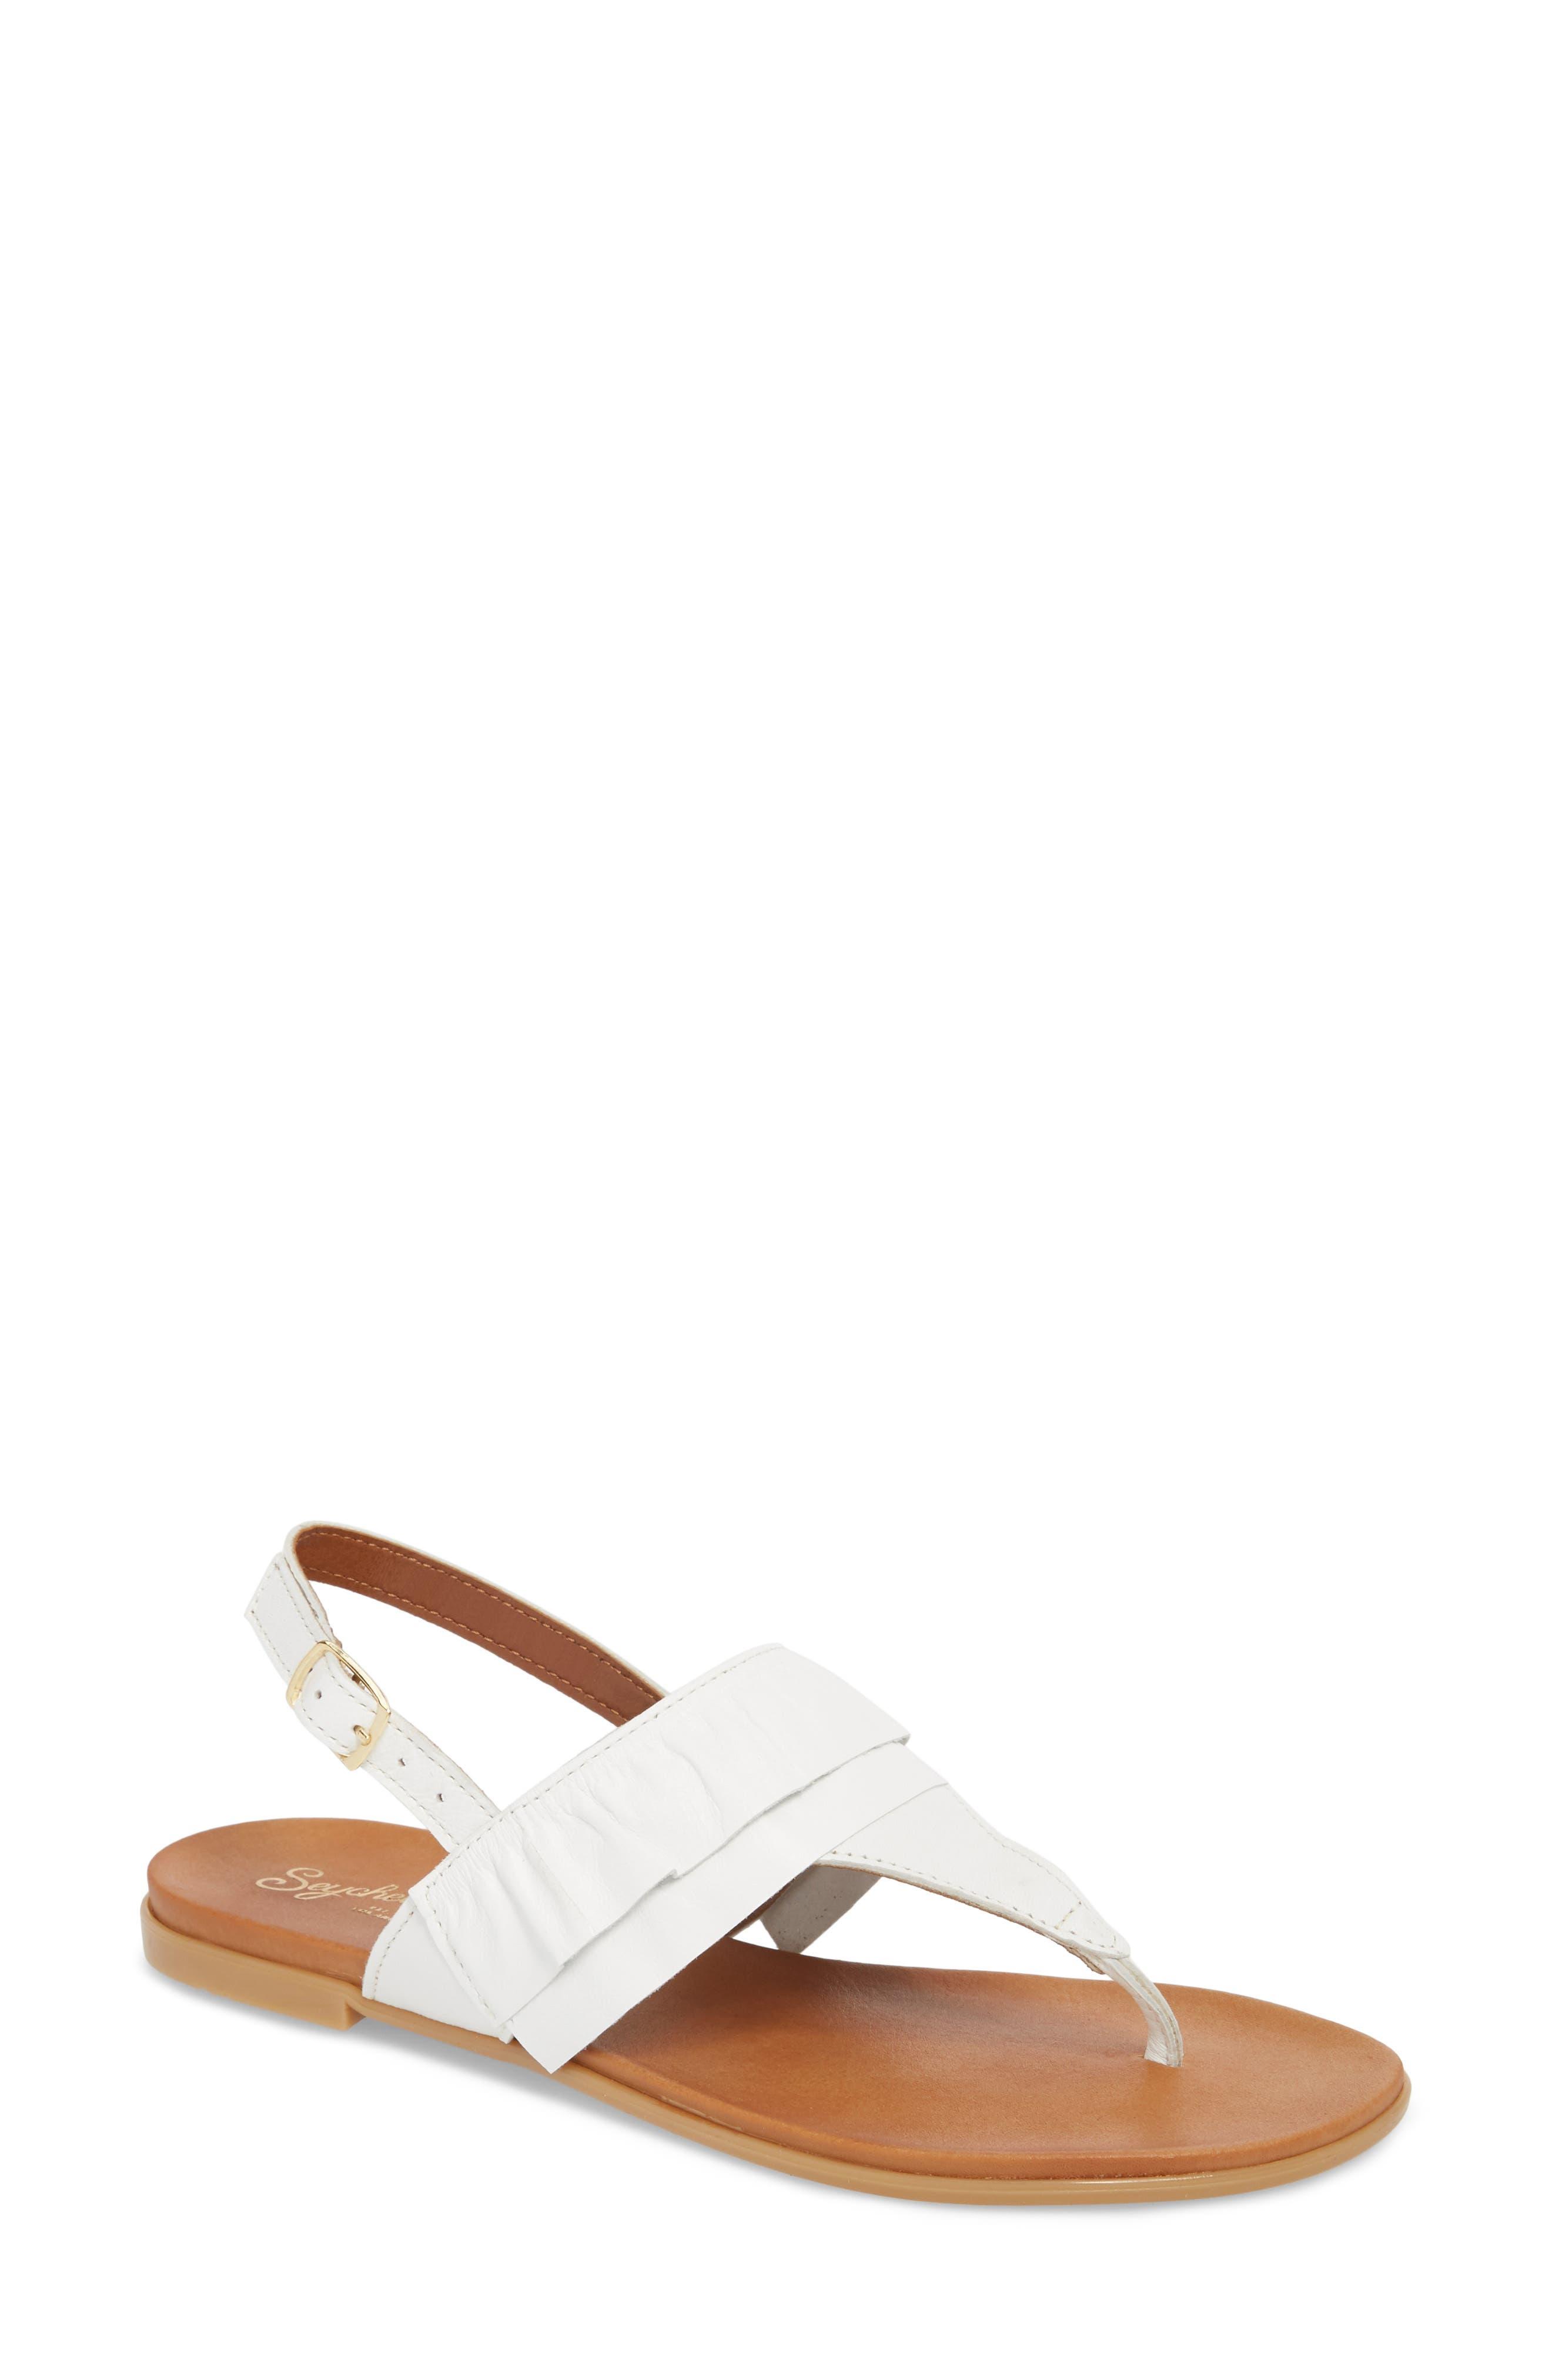 Seclusion Ruffle Sandal,                             Main thumbnail 1, color,                             White Leather